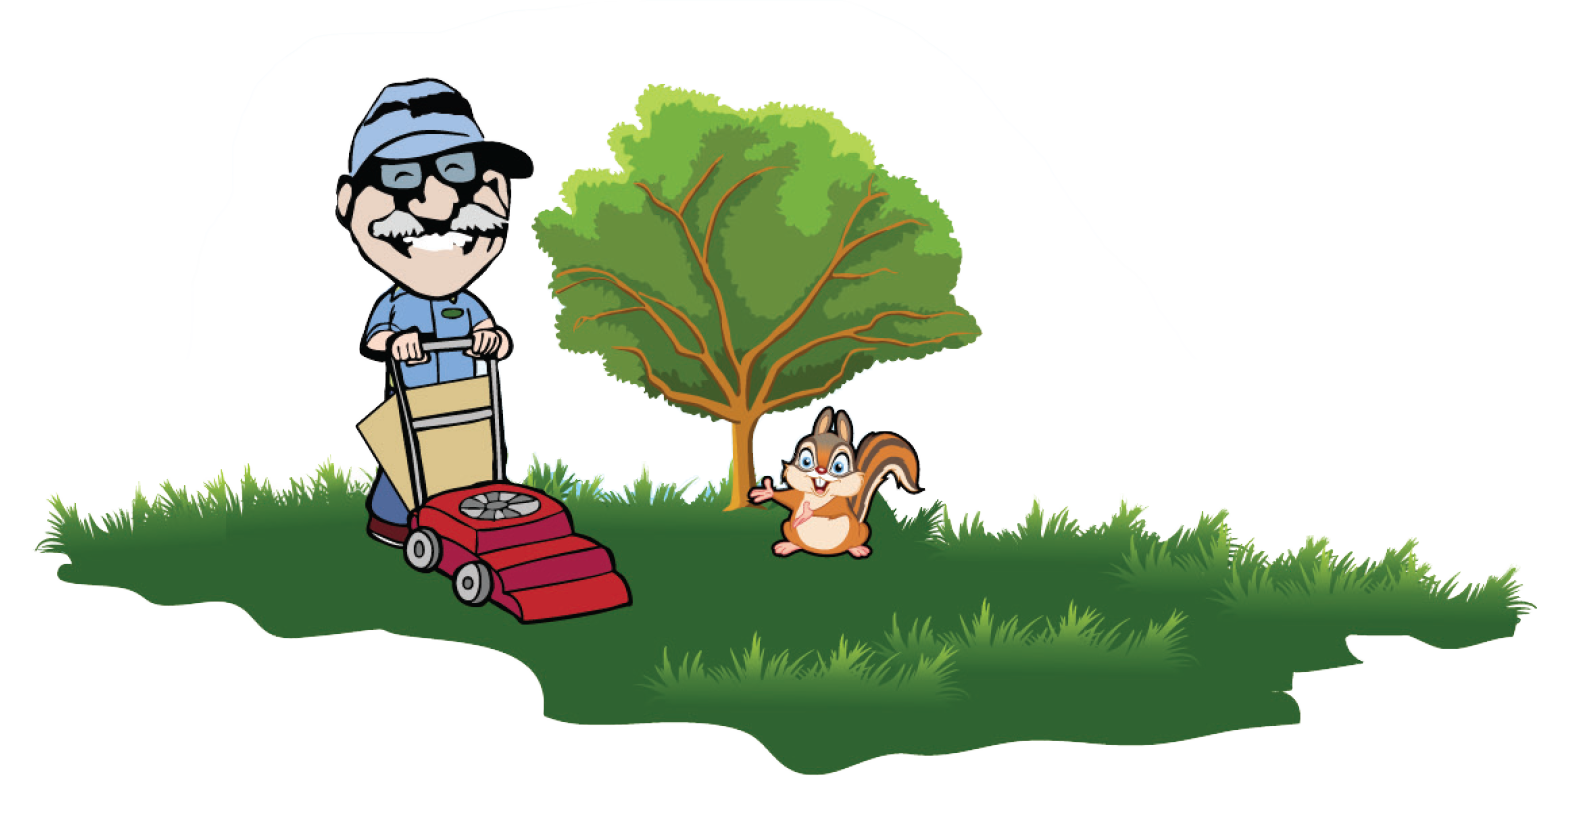 Gardening clipart groundskeeper, Gardening groundskeeper.